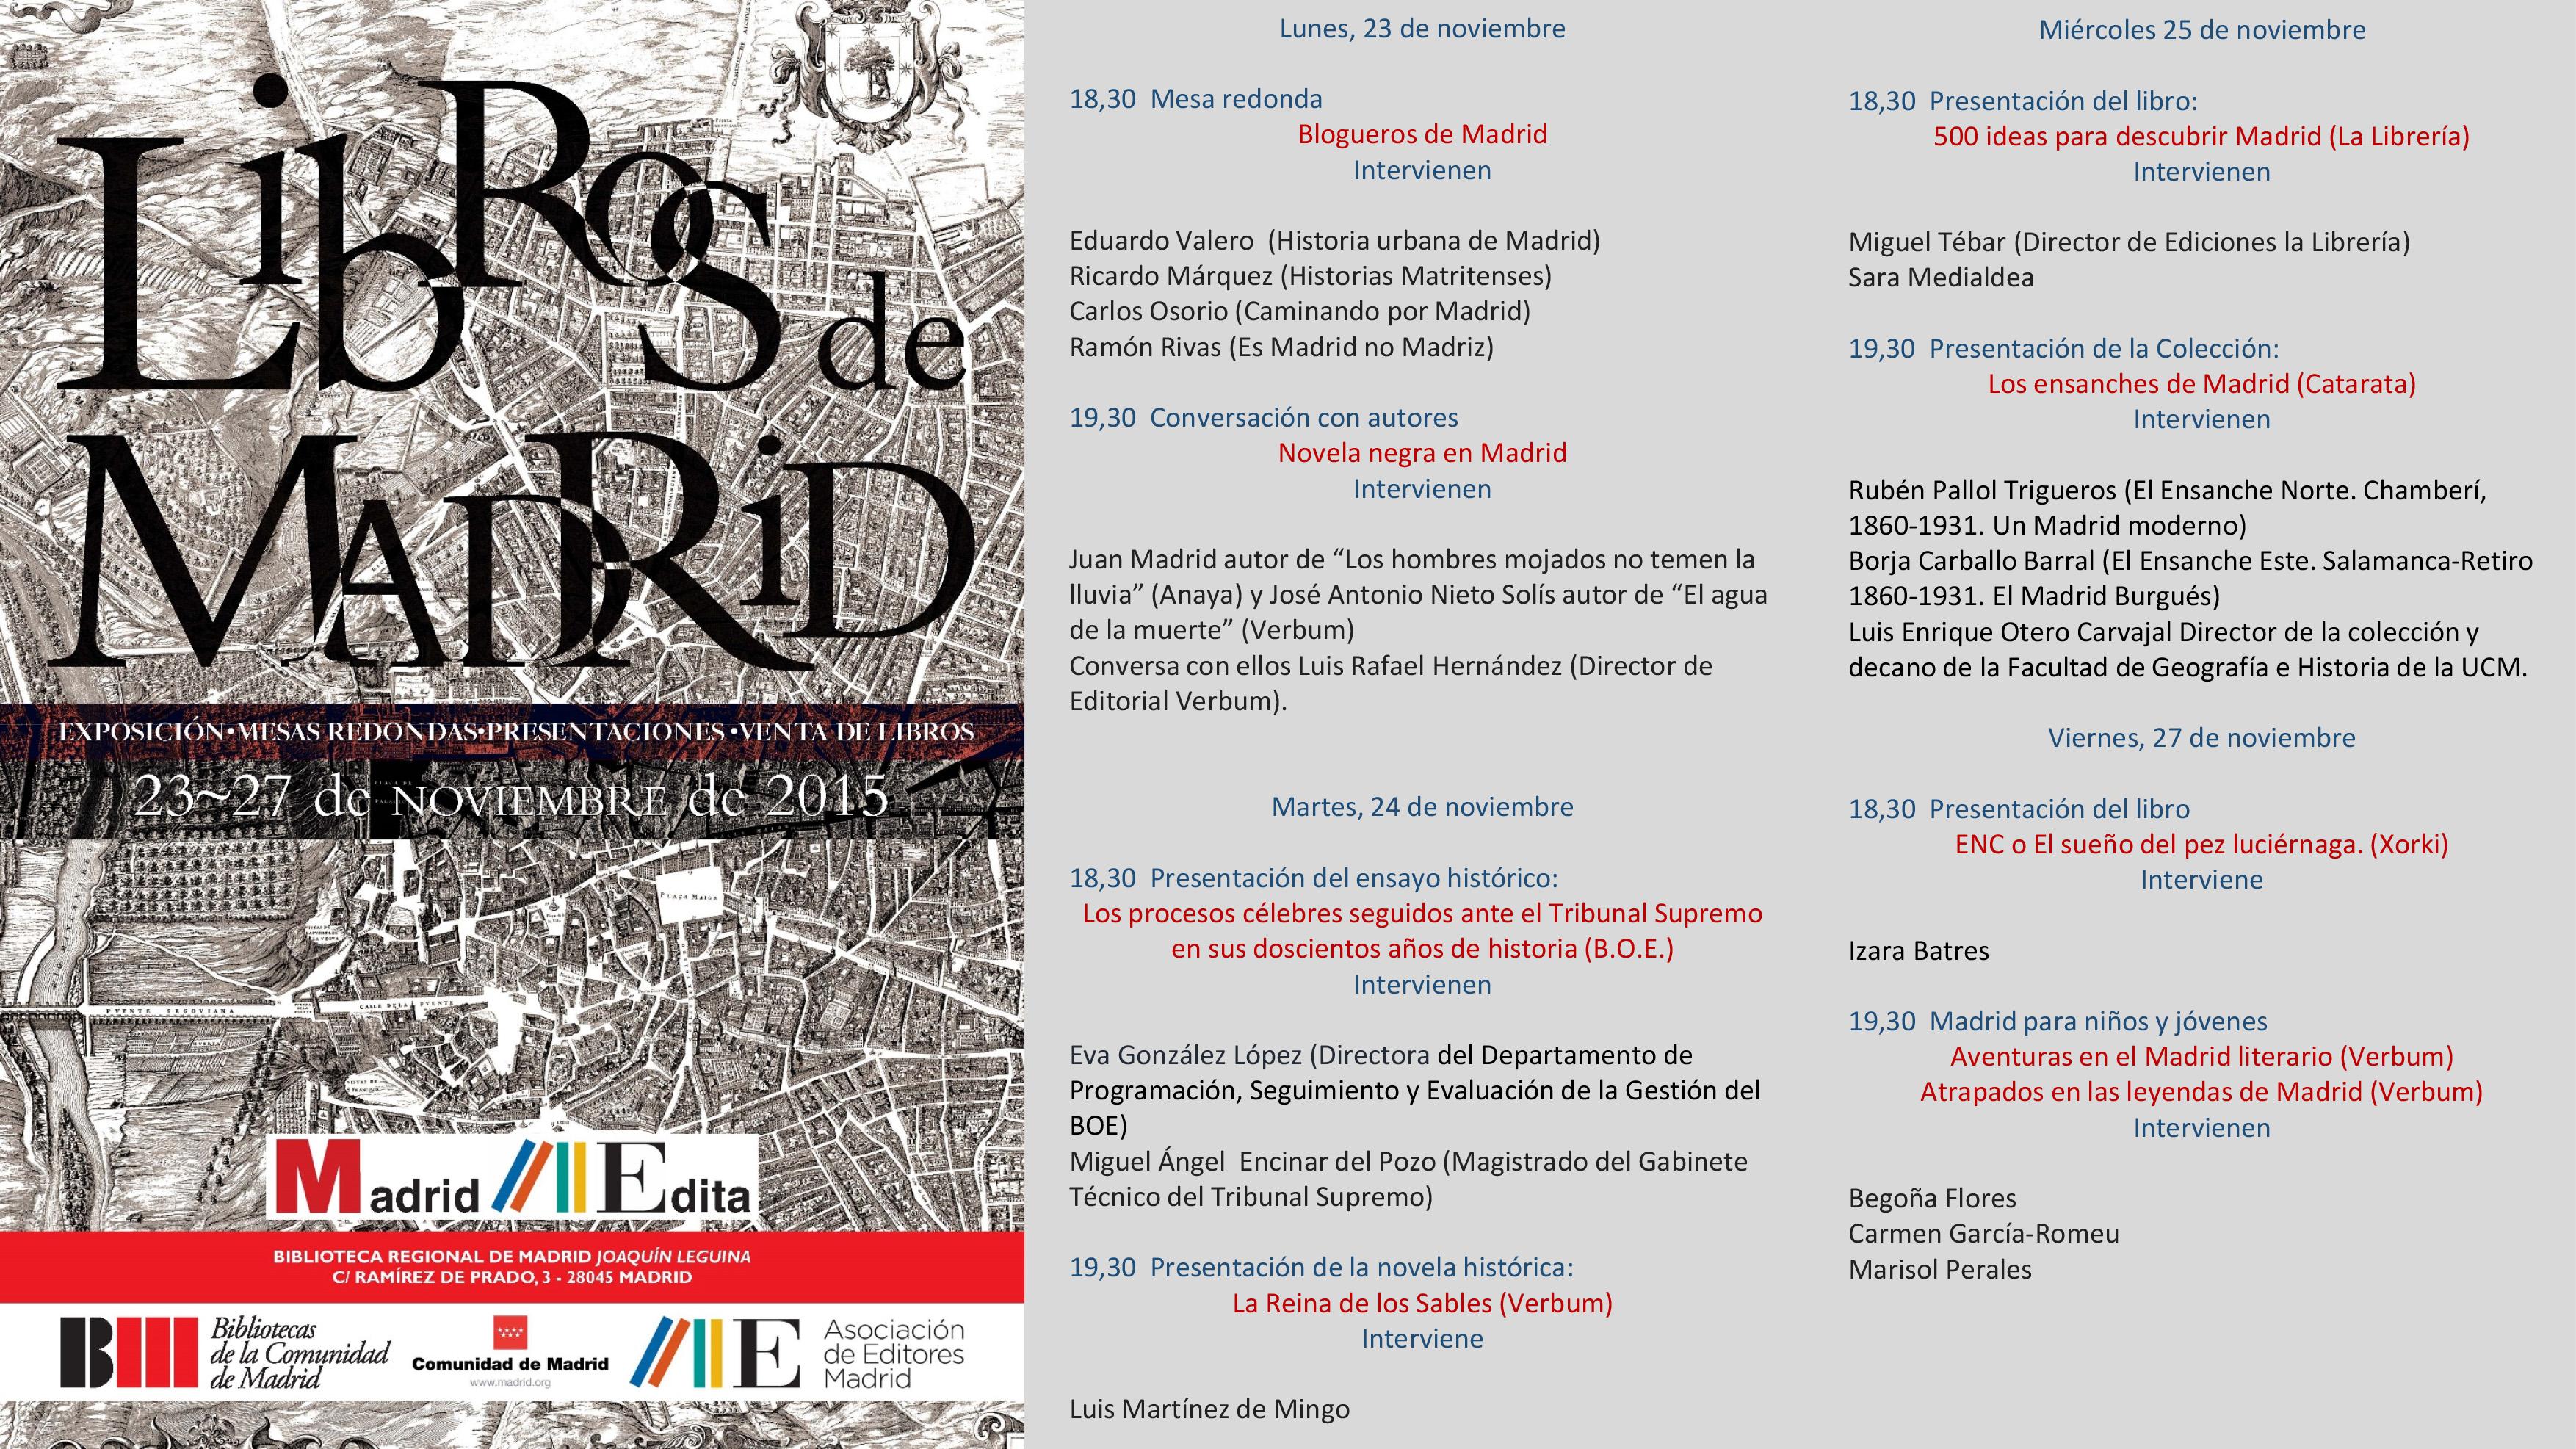 Madrid Edita Programa.jpg